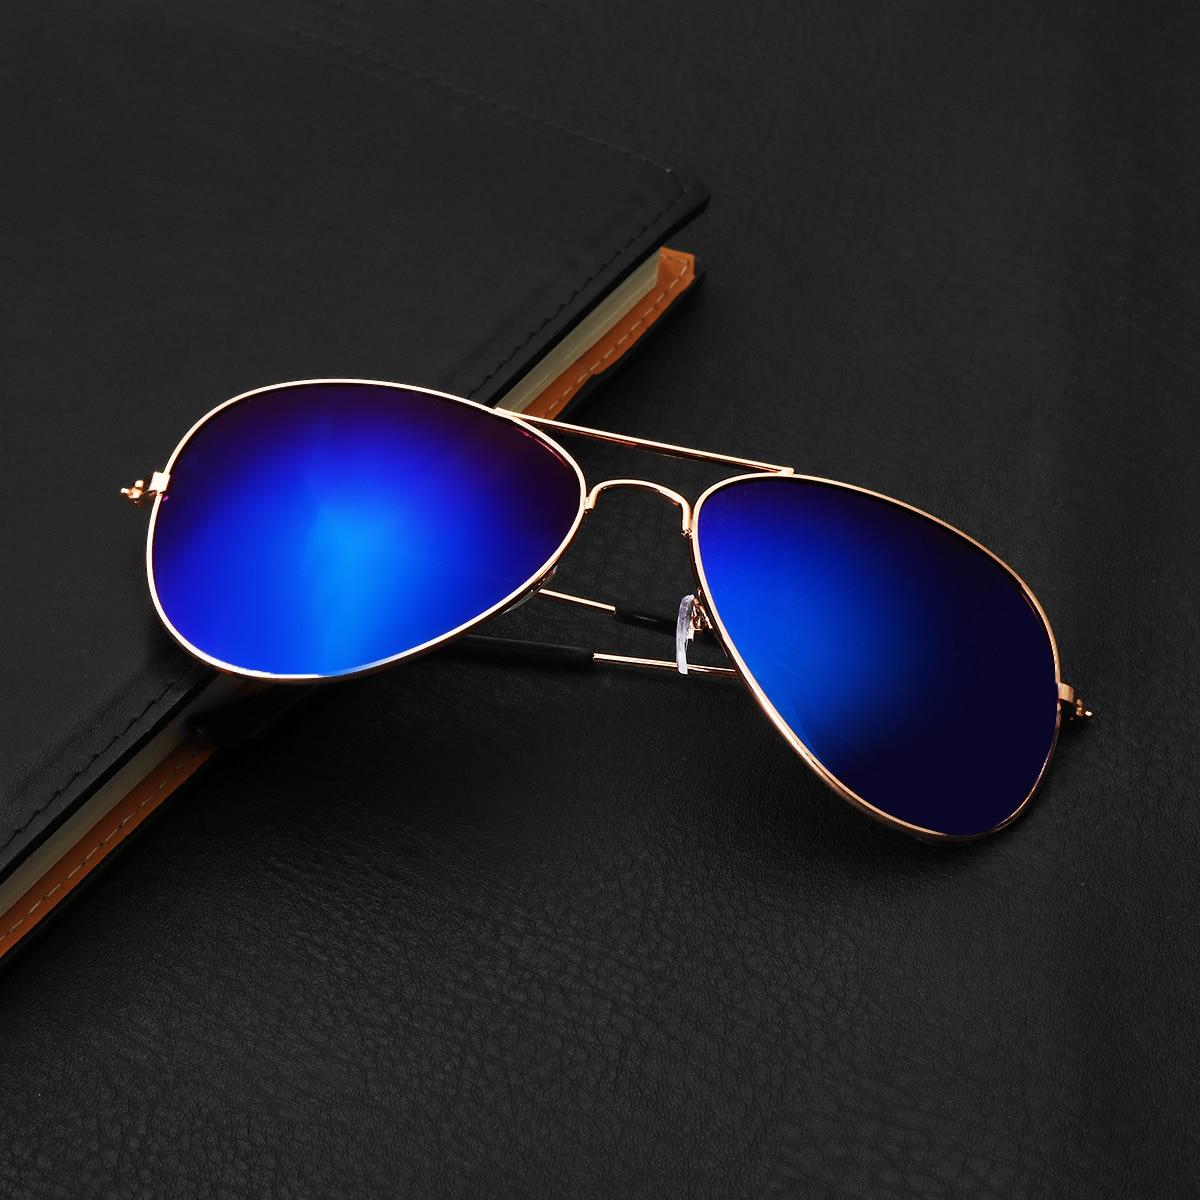 Men Women Retro Sunglasses Fishing Golf Ball Finder Glasses Eye Protection Golf Accessories Blue Lenses Outdoor Sport Sun Glass|Golf Car Parts & Accessories| |  - title=